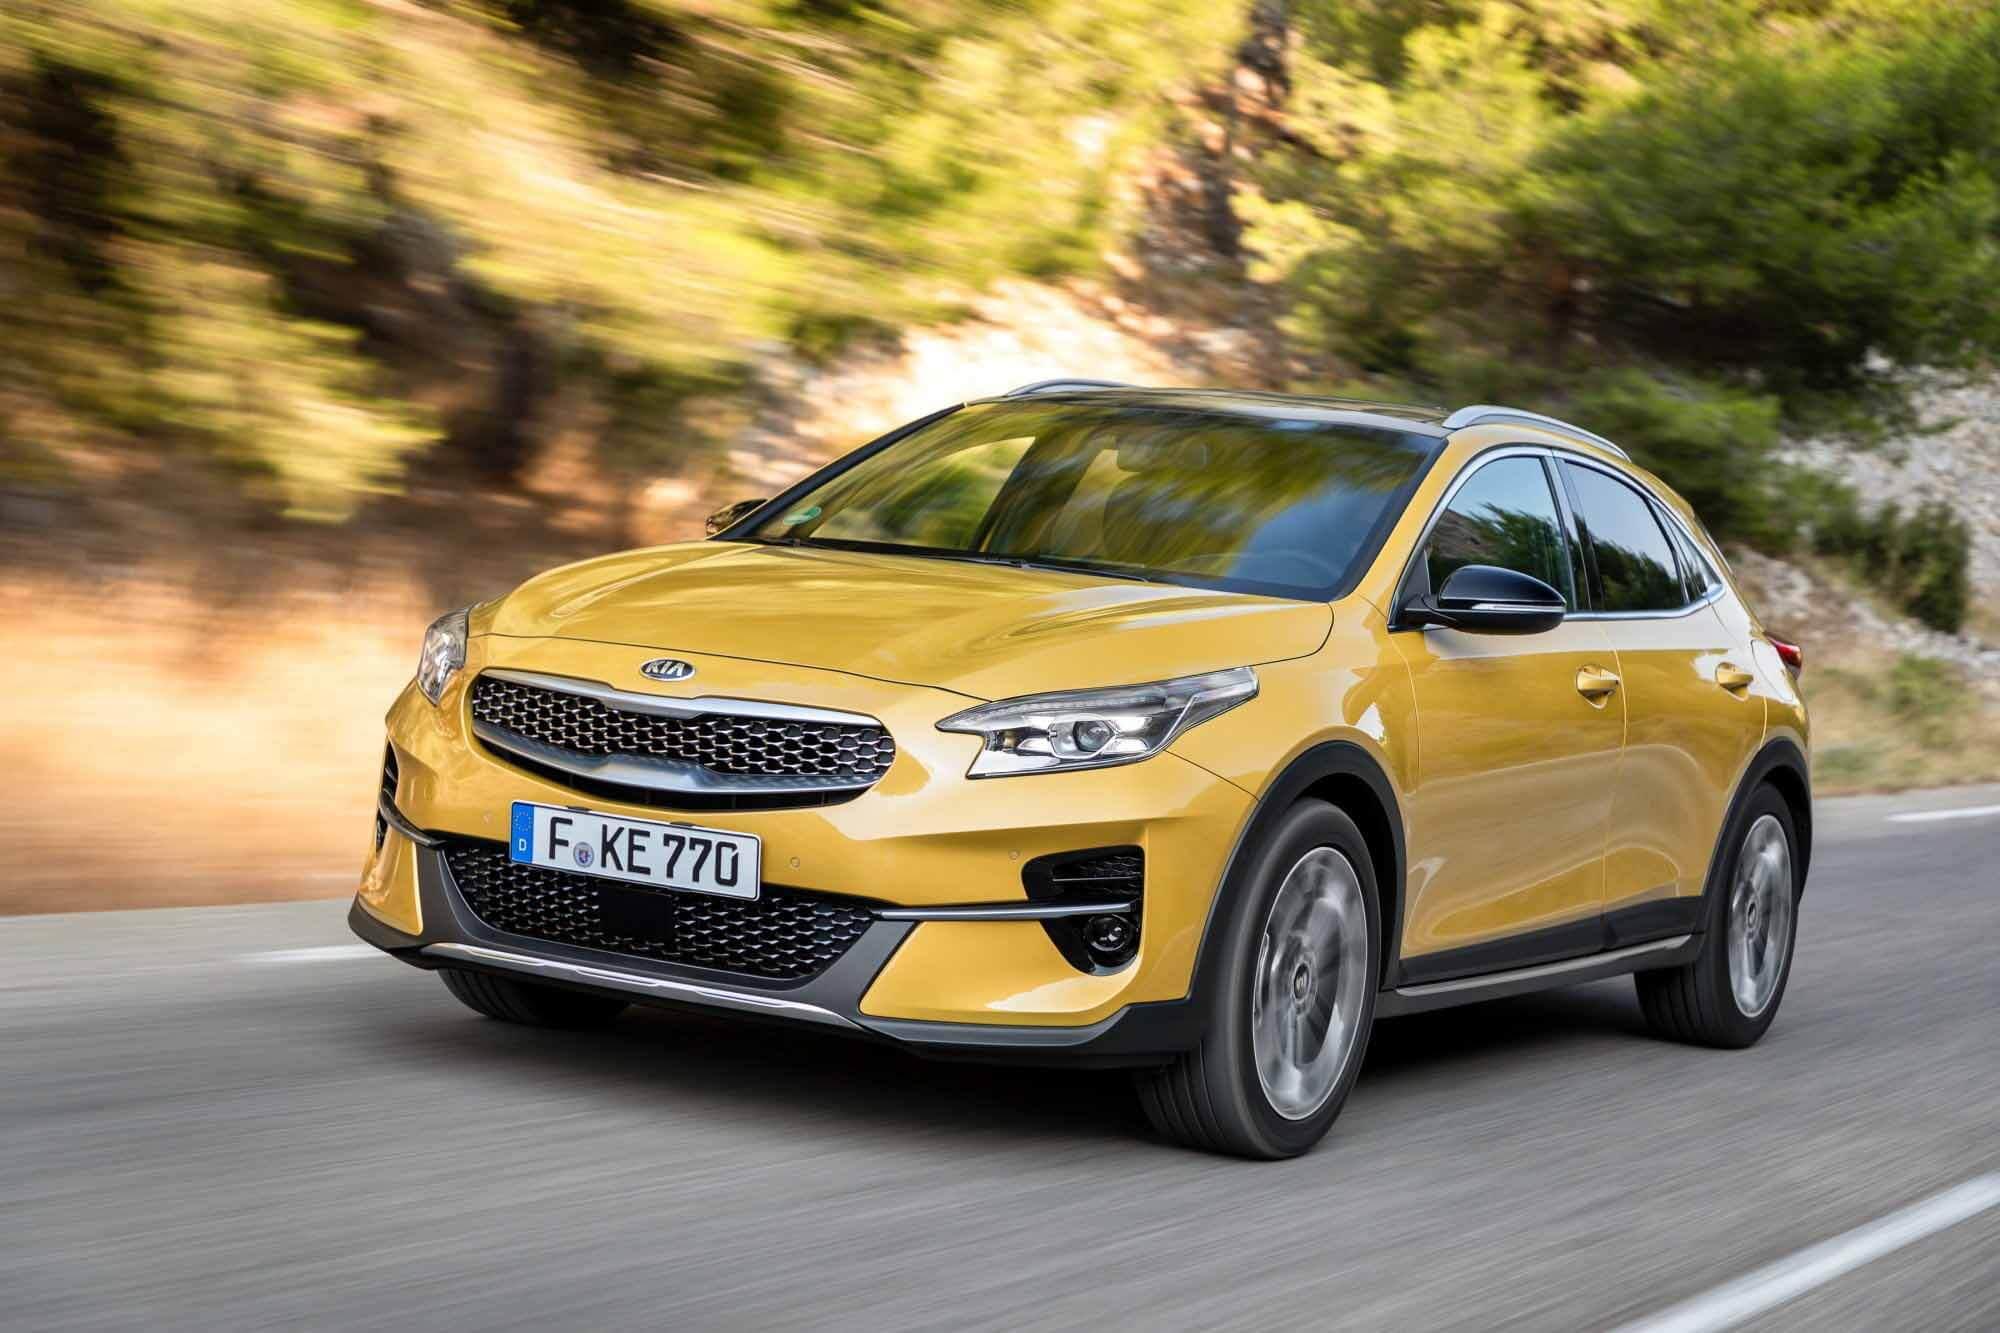 Kia XCeed за 1,5 миллиона: «отвертка» от «Автотора», кузов - из Словакии, замена масла - раз в полгода